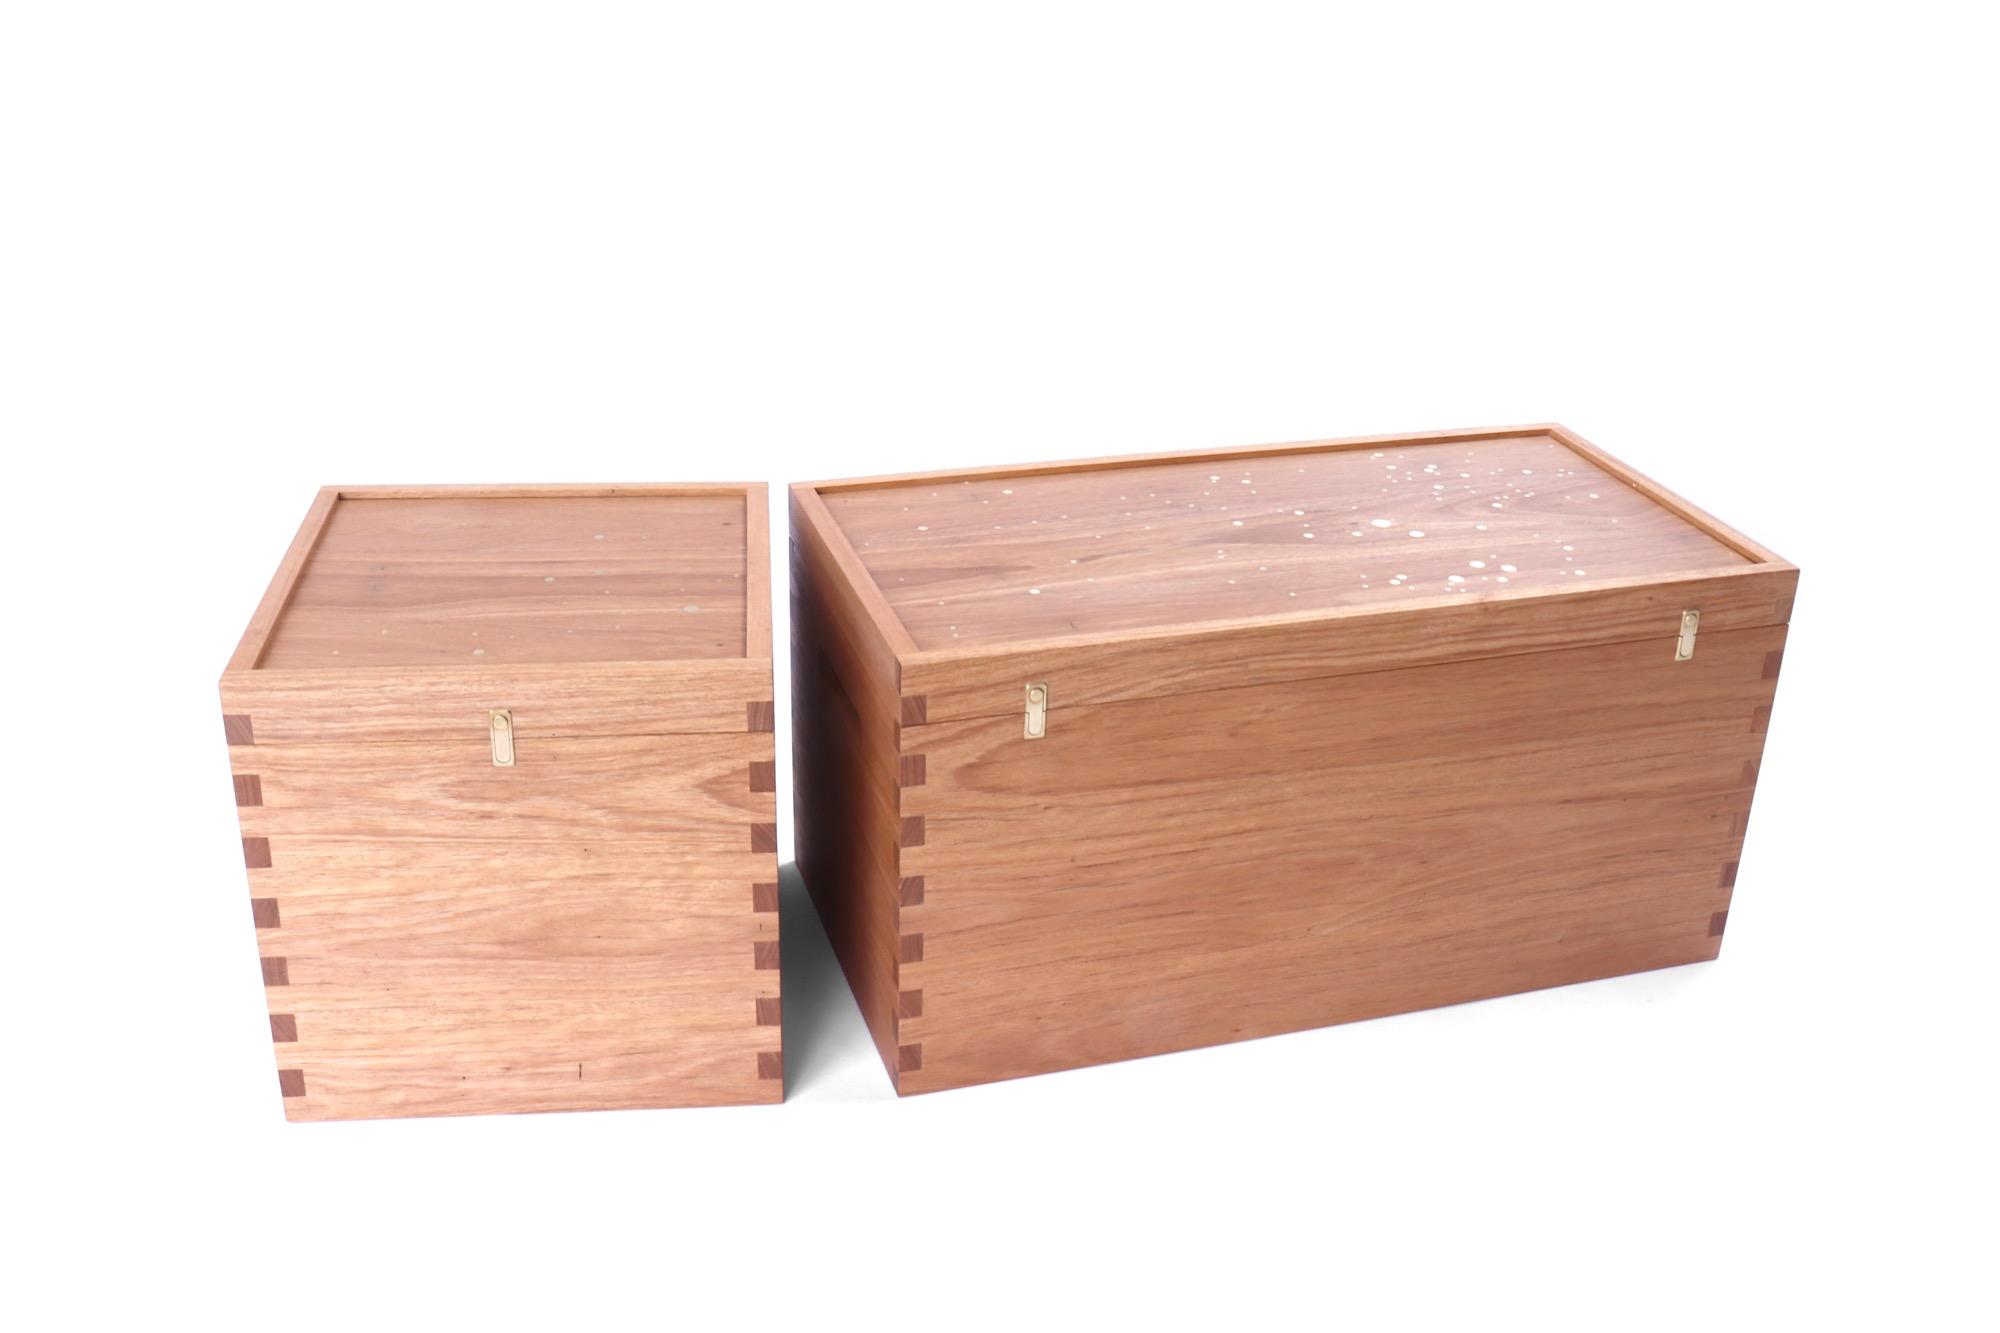 Star Boxes by Sawdust Bureau 2000 res_03